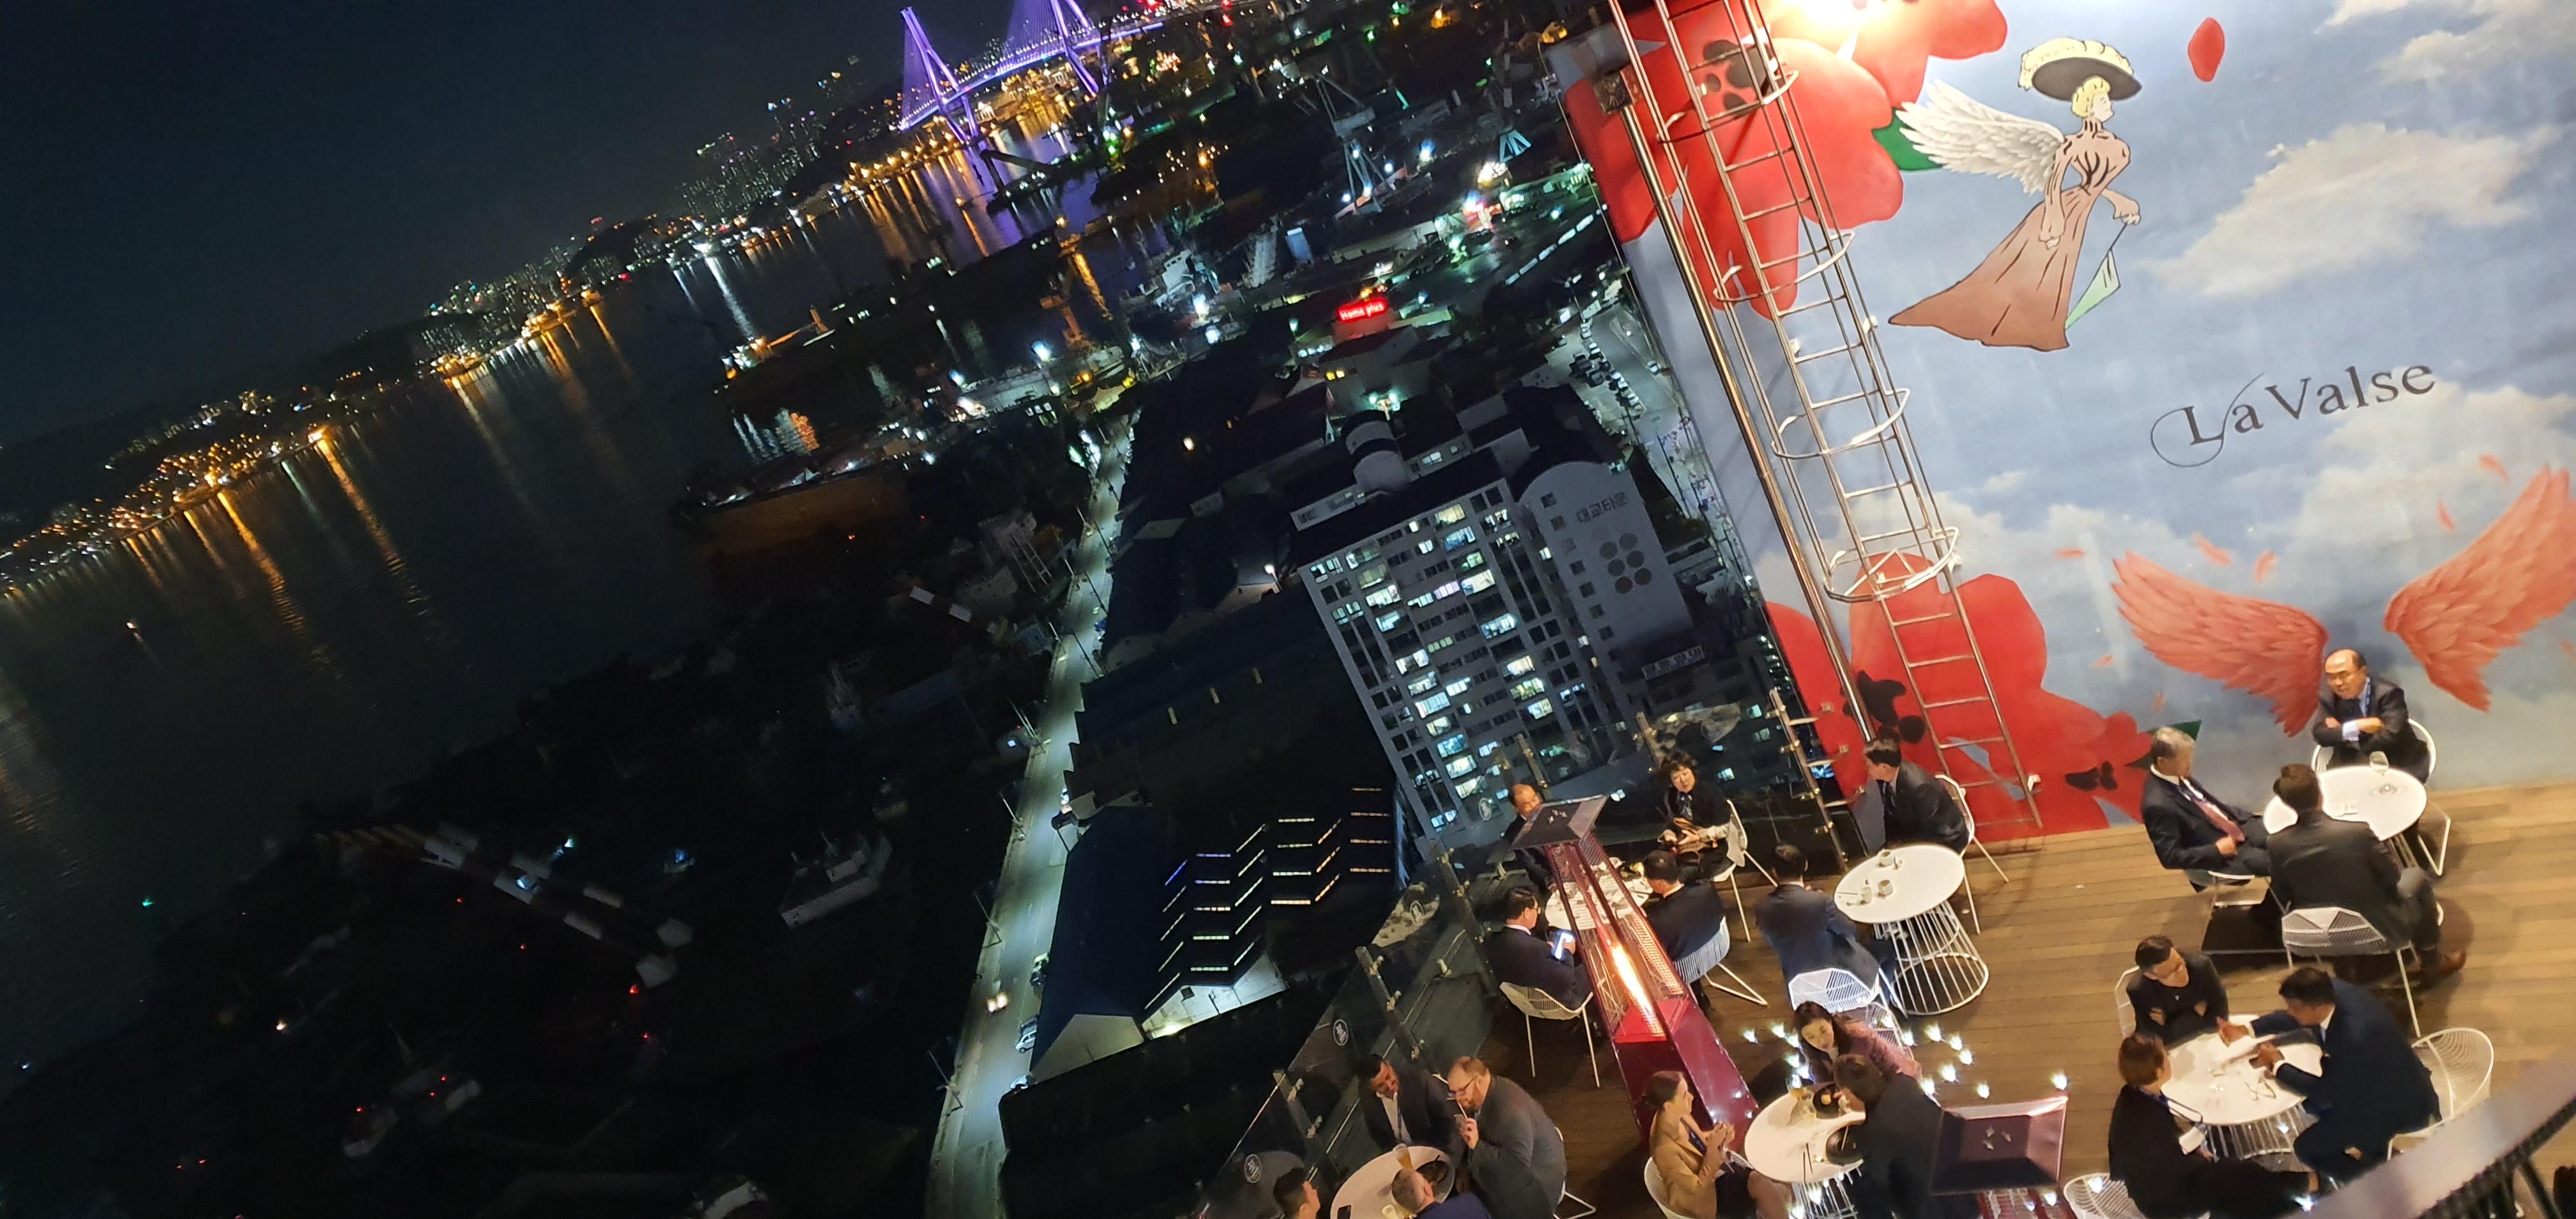 BIPC2019 Busan Port Authority Reception on May 31